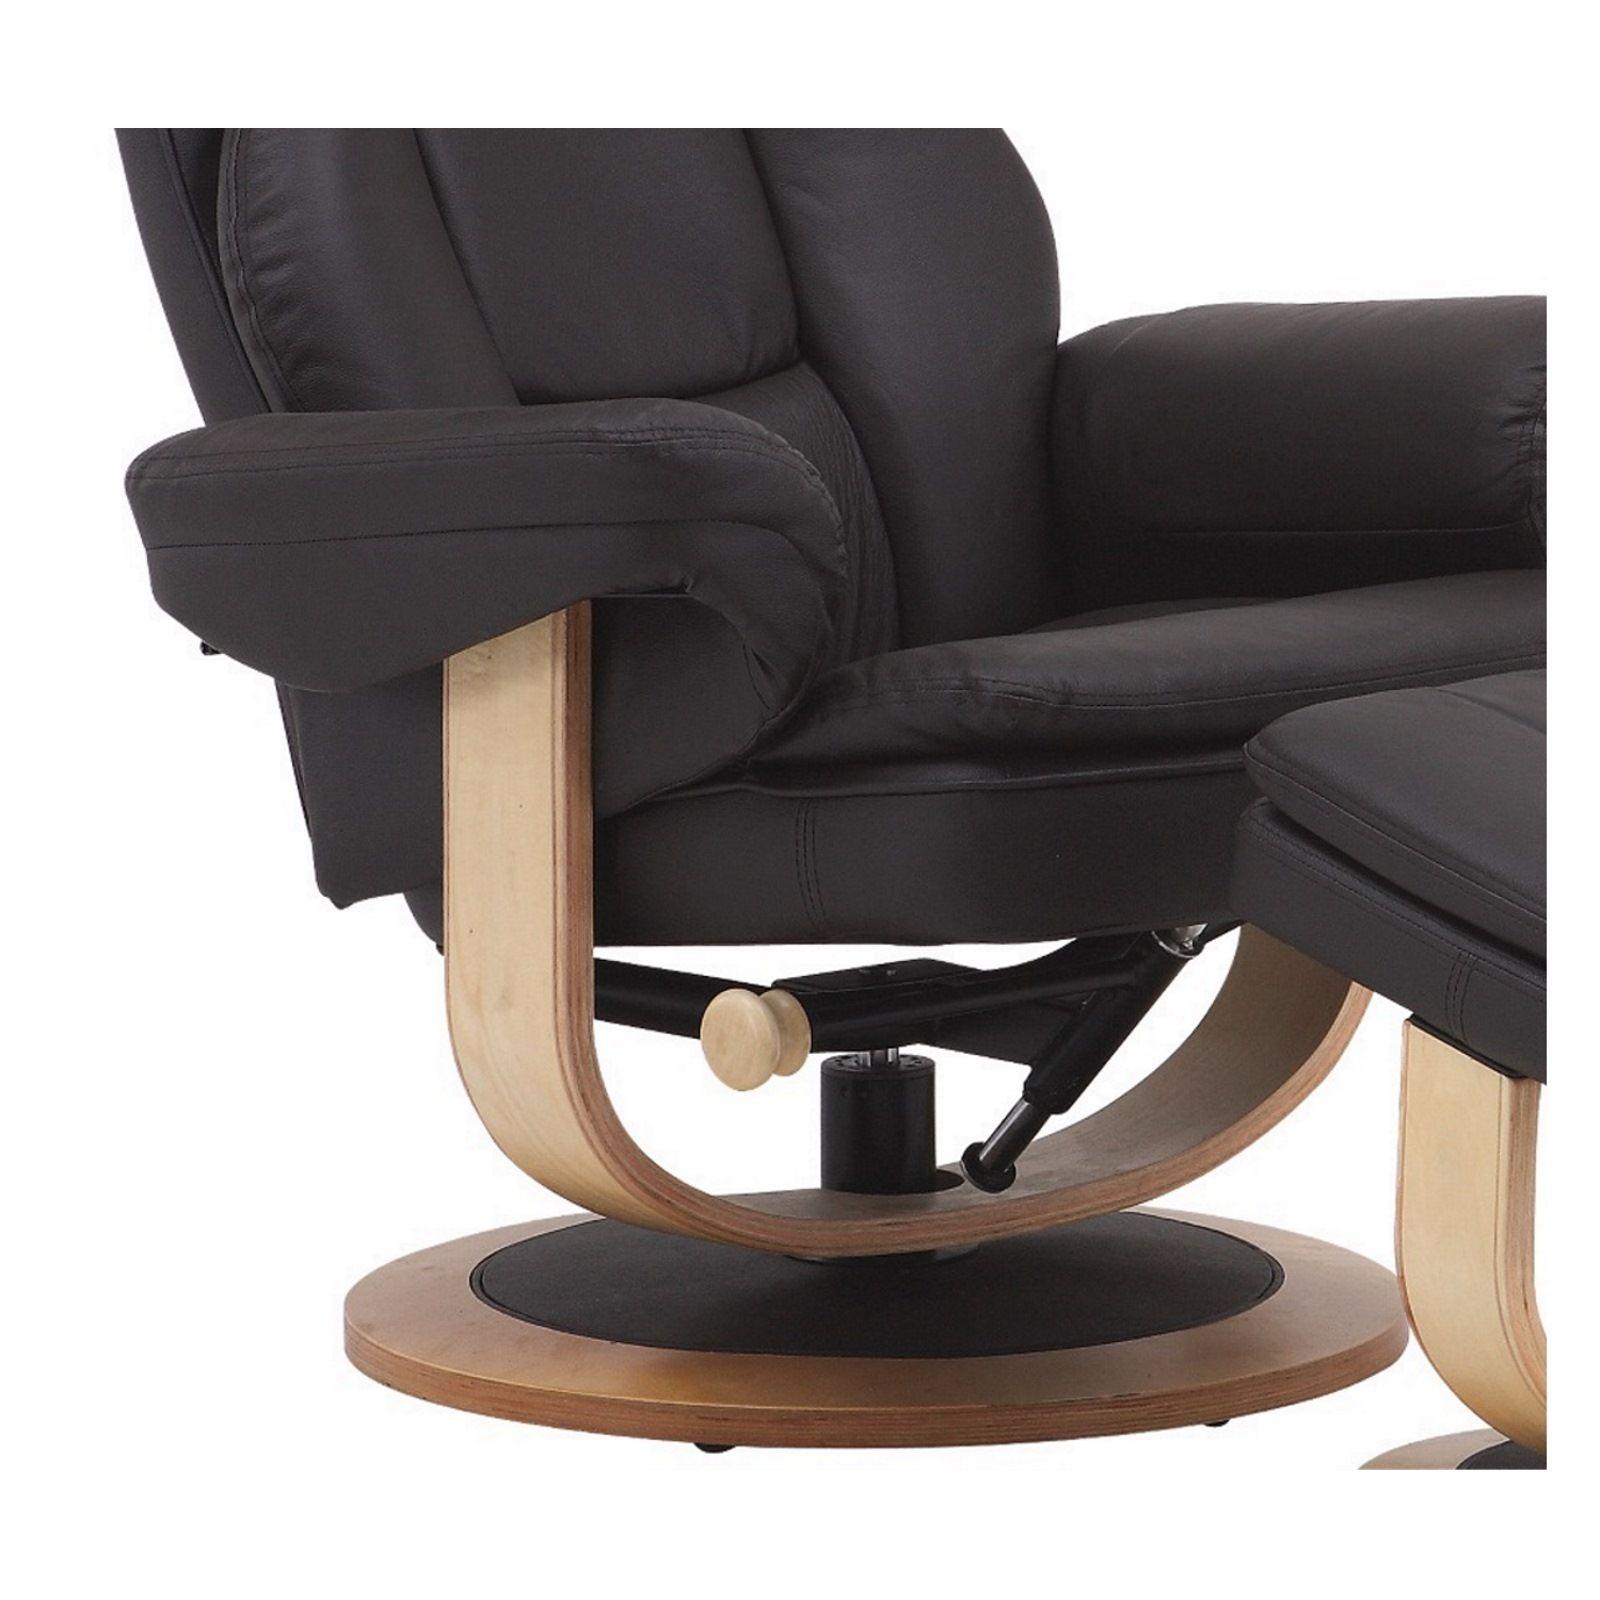 fernsehsessel hocker leder drehbar relaxsessel tv ledersessel braun ebay. Black Bedroom Furniture Sets. Home Design Ideas